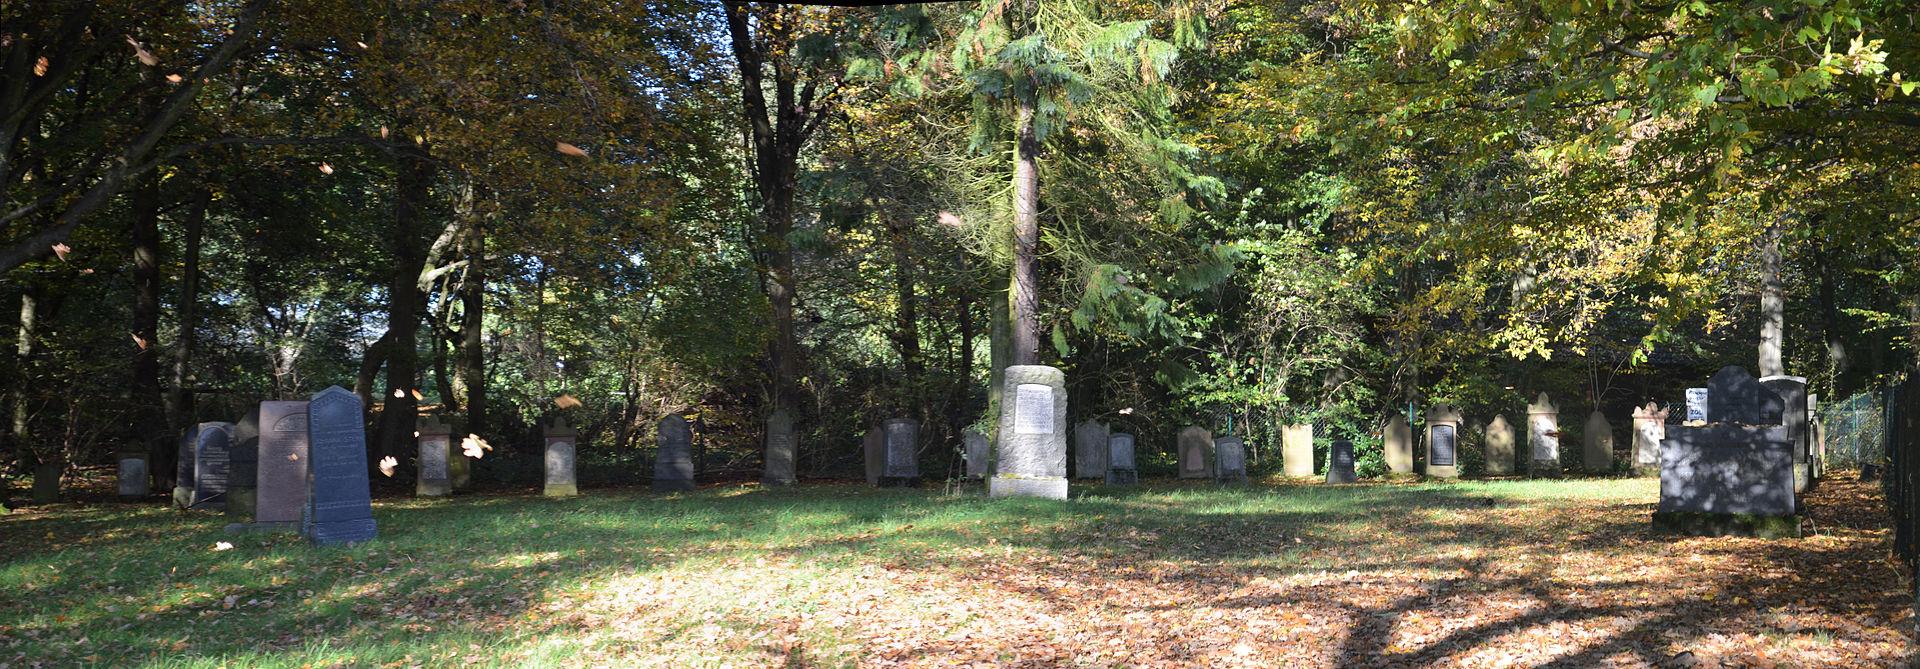 Burgholzhausen, jüdischer Friedhof (1).jpg